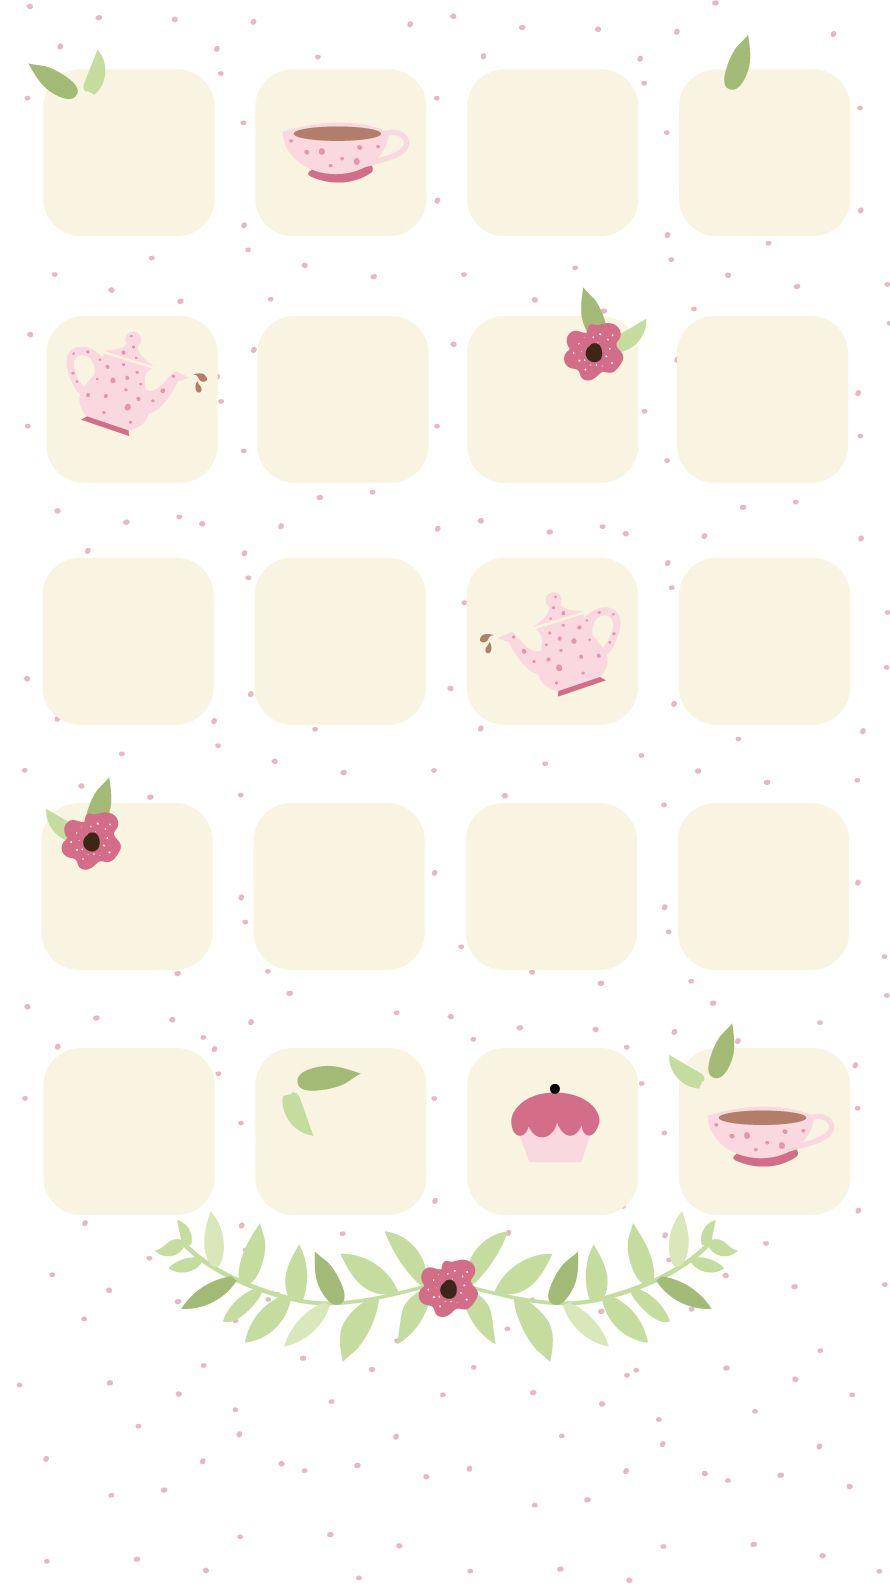 Simple Girly TeaTime iPhone Home Screen Wallpaper PanPins